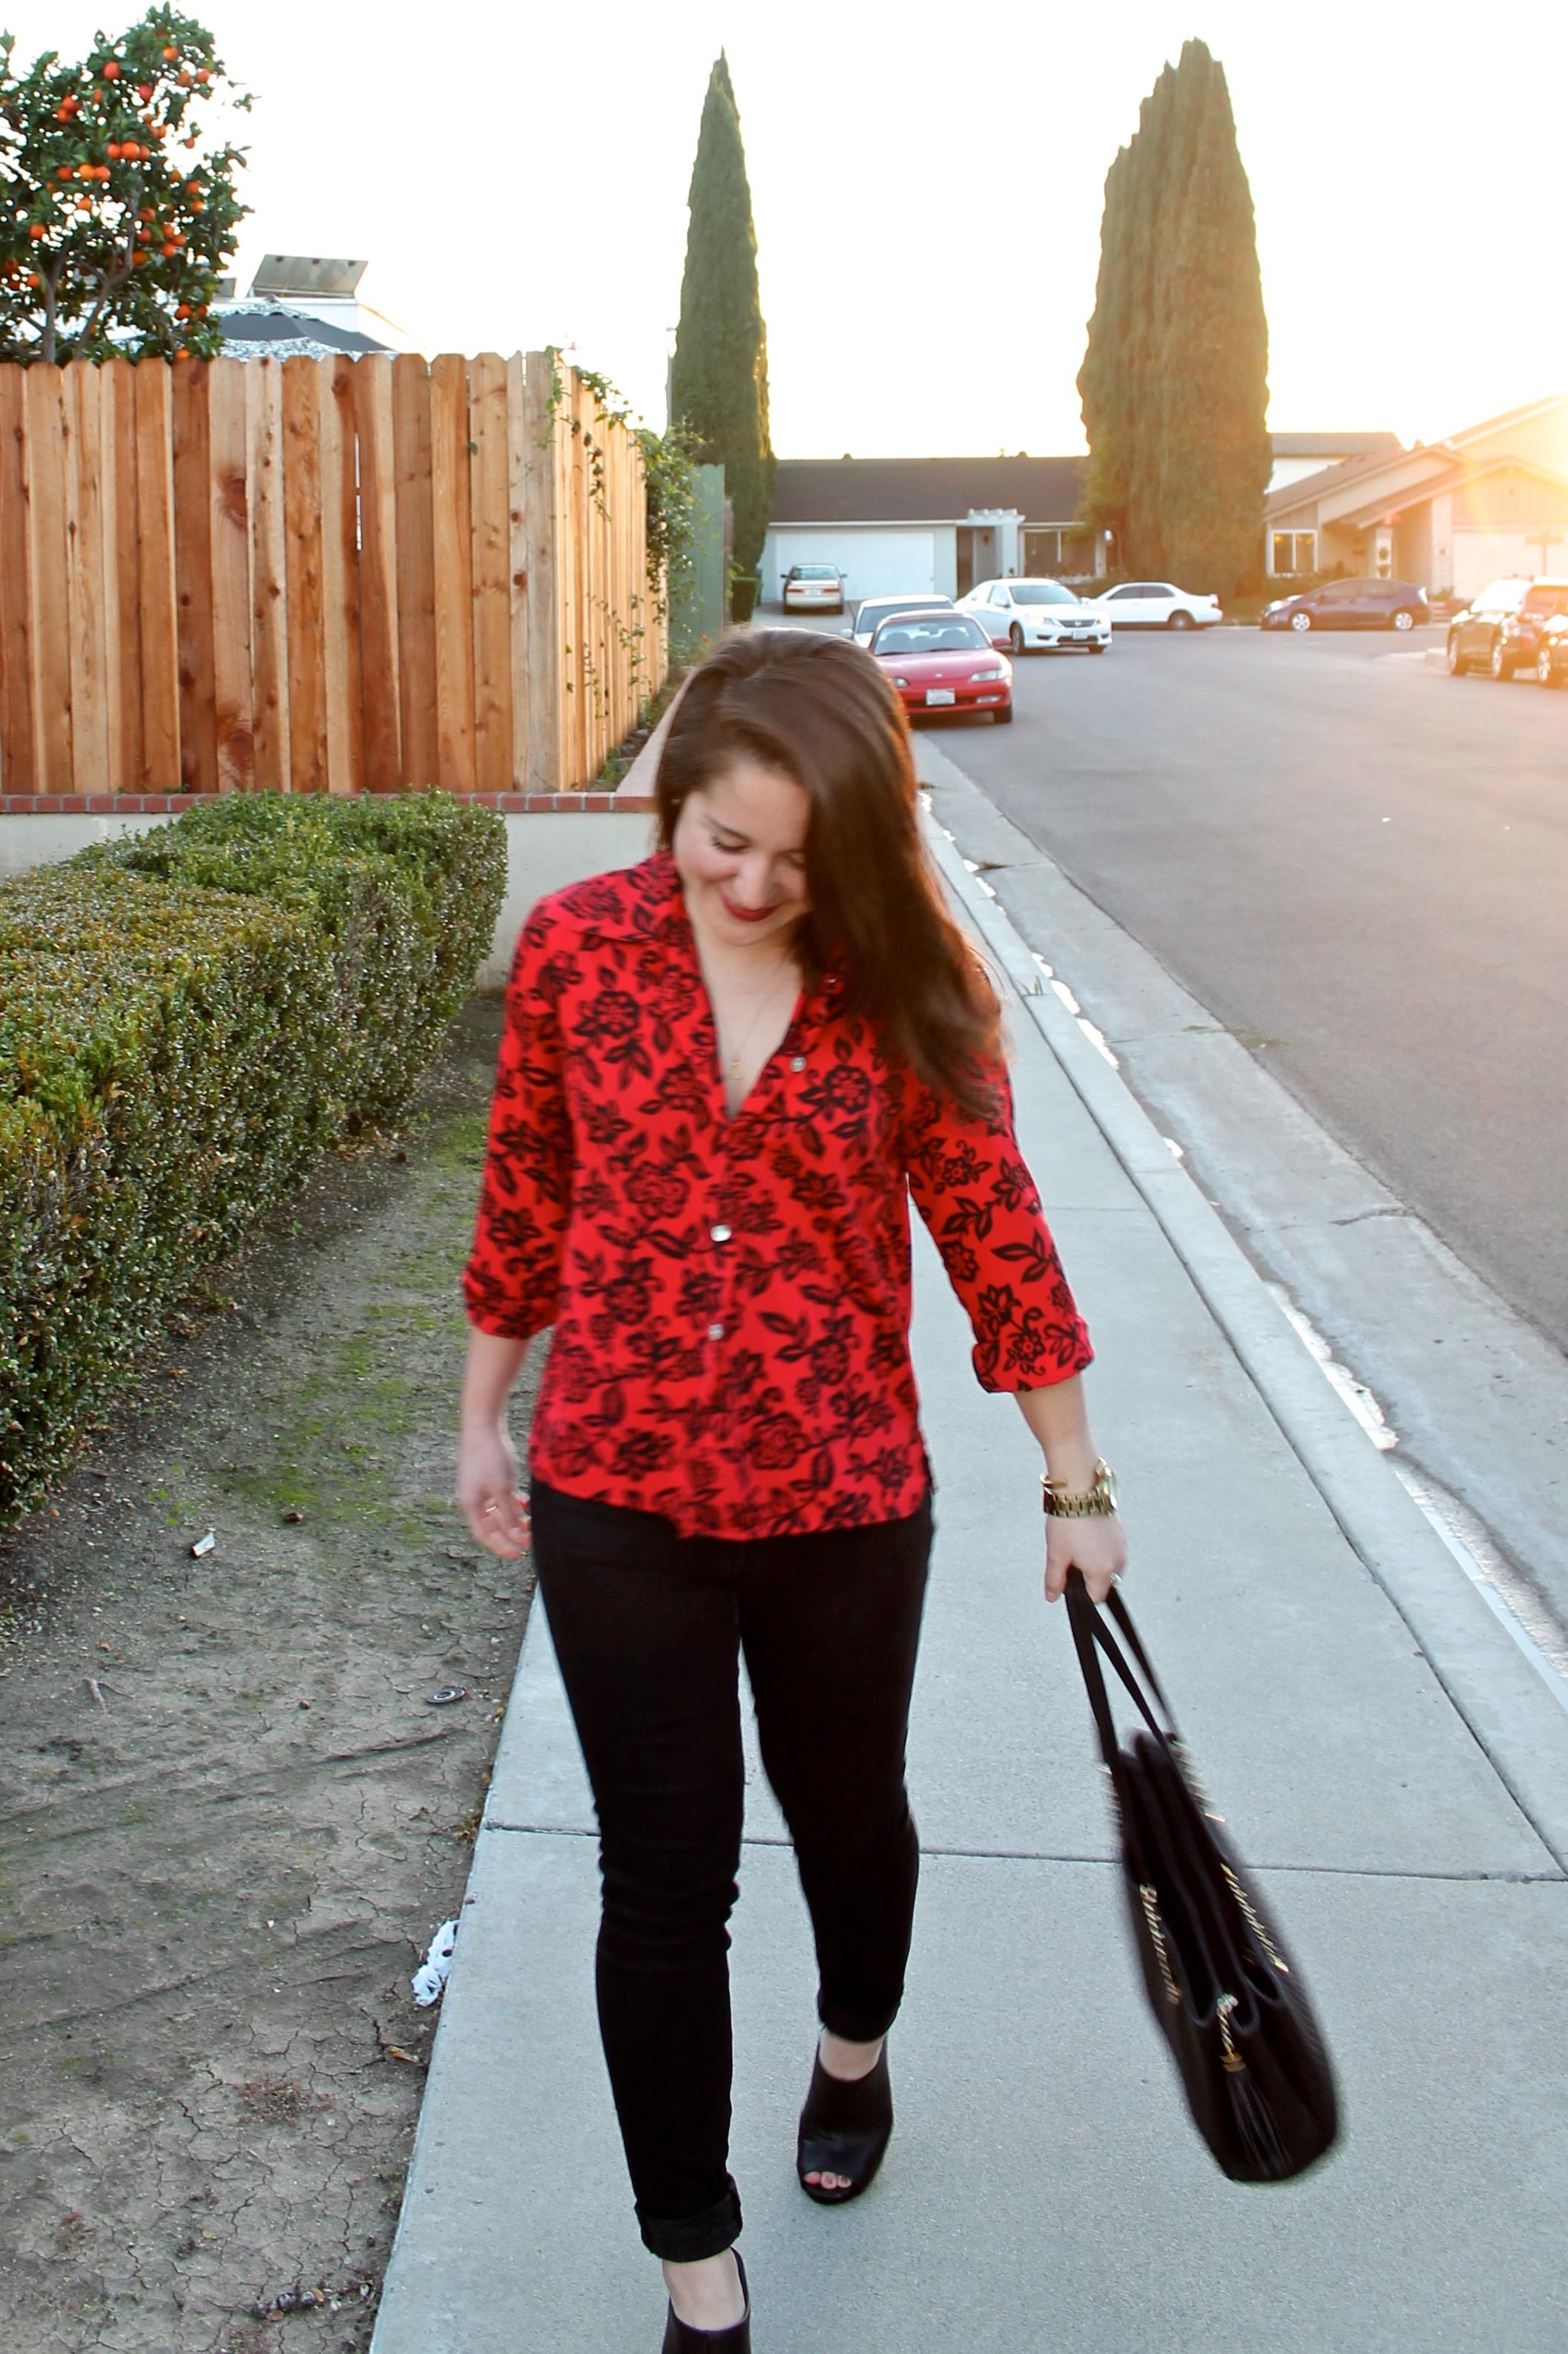 holiday #outfit idea: vintage blouse + black denim + black mules